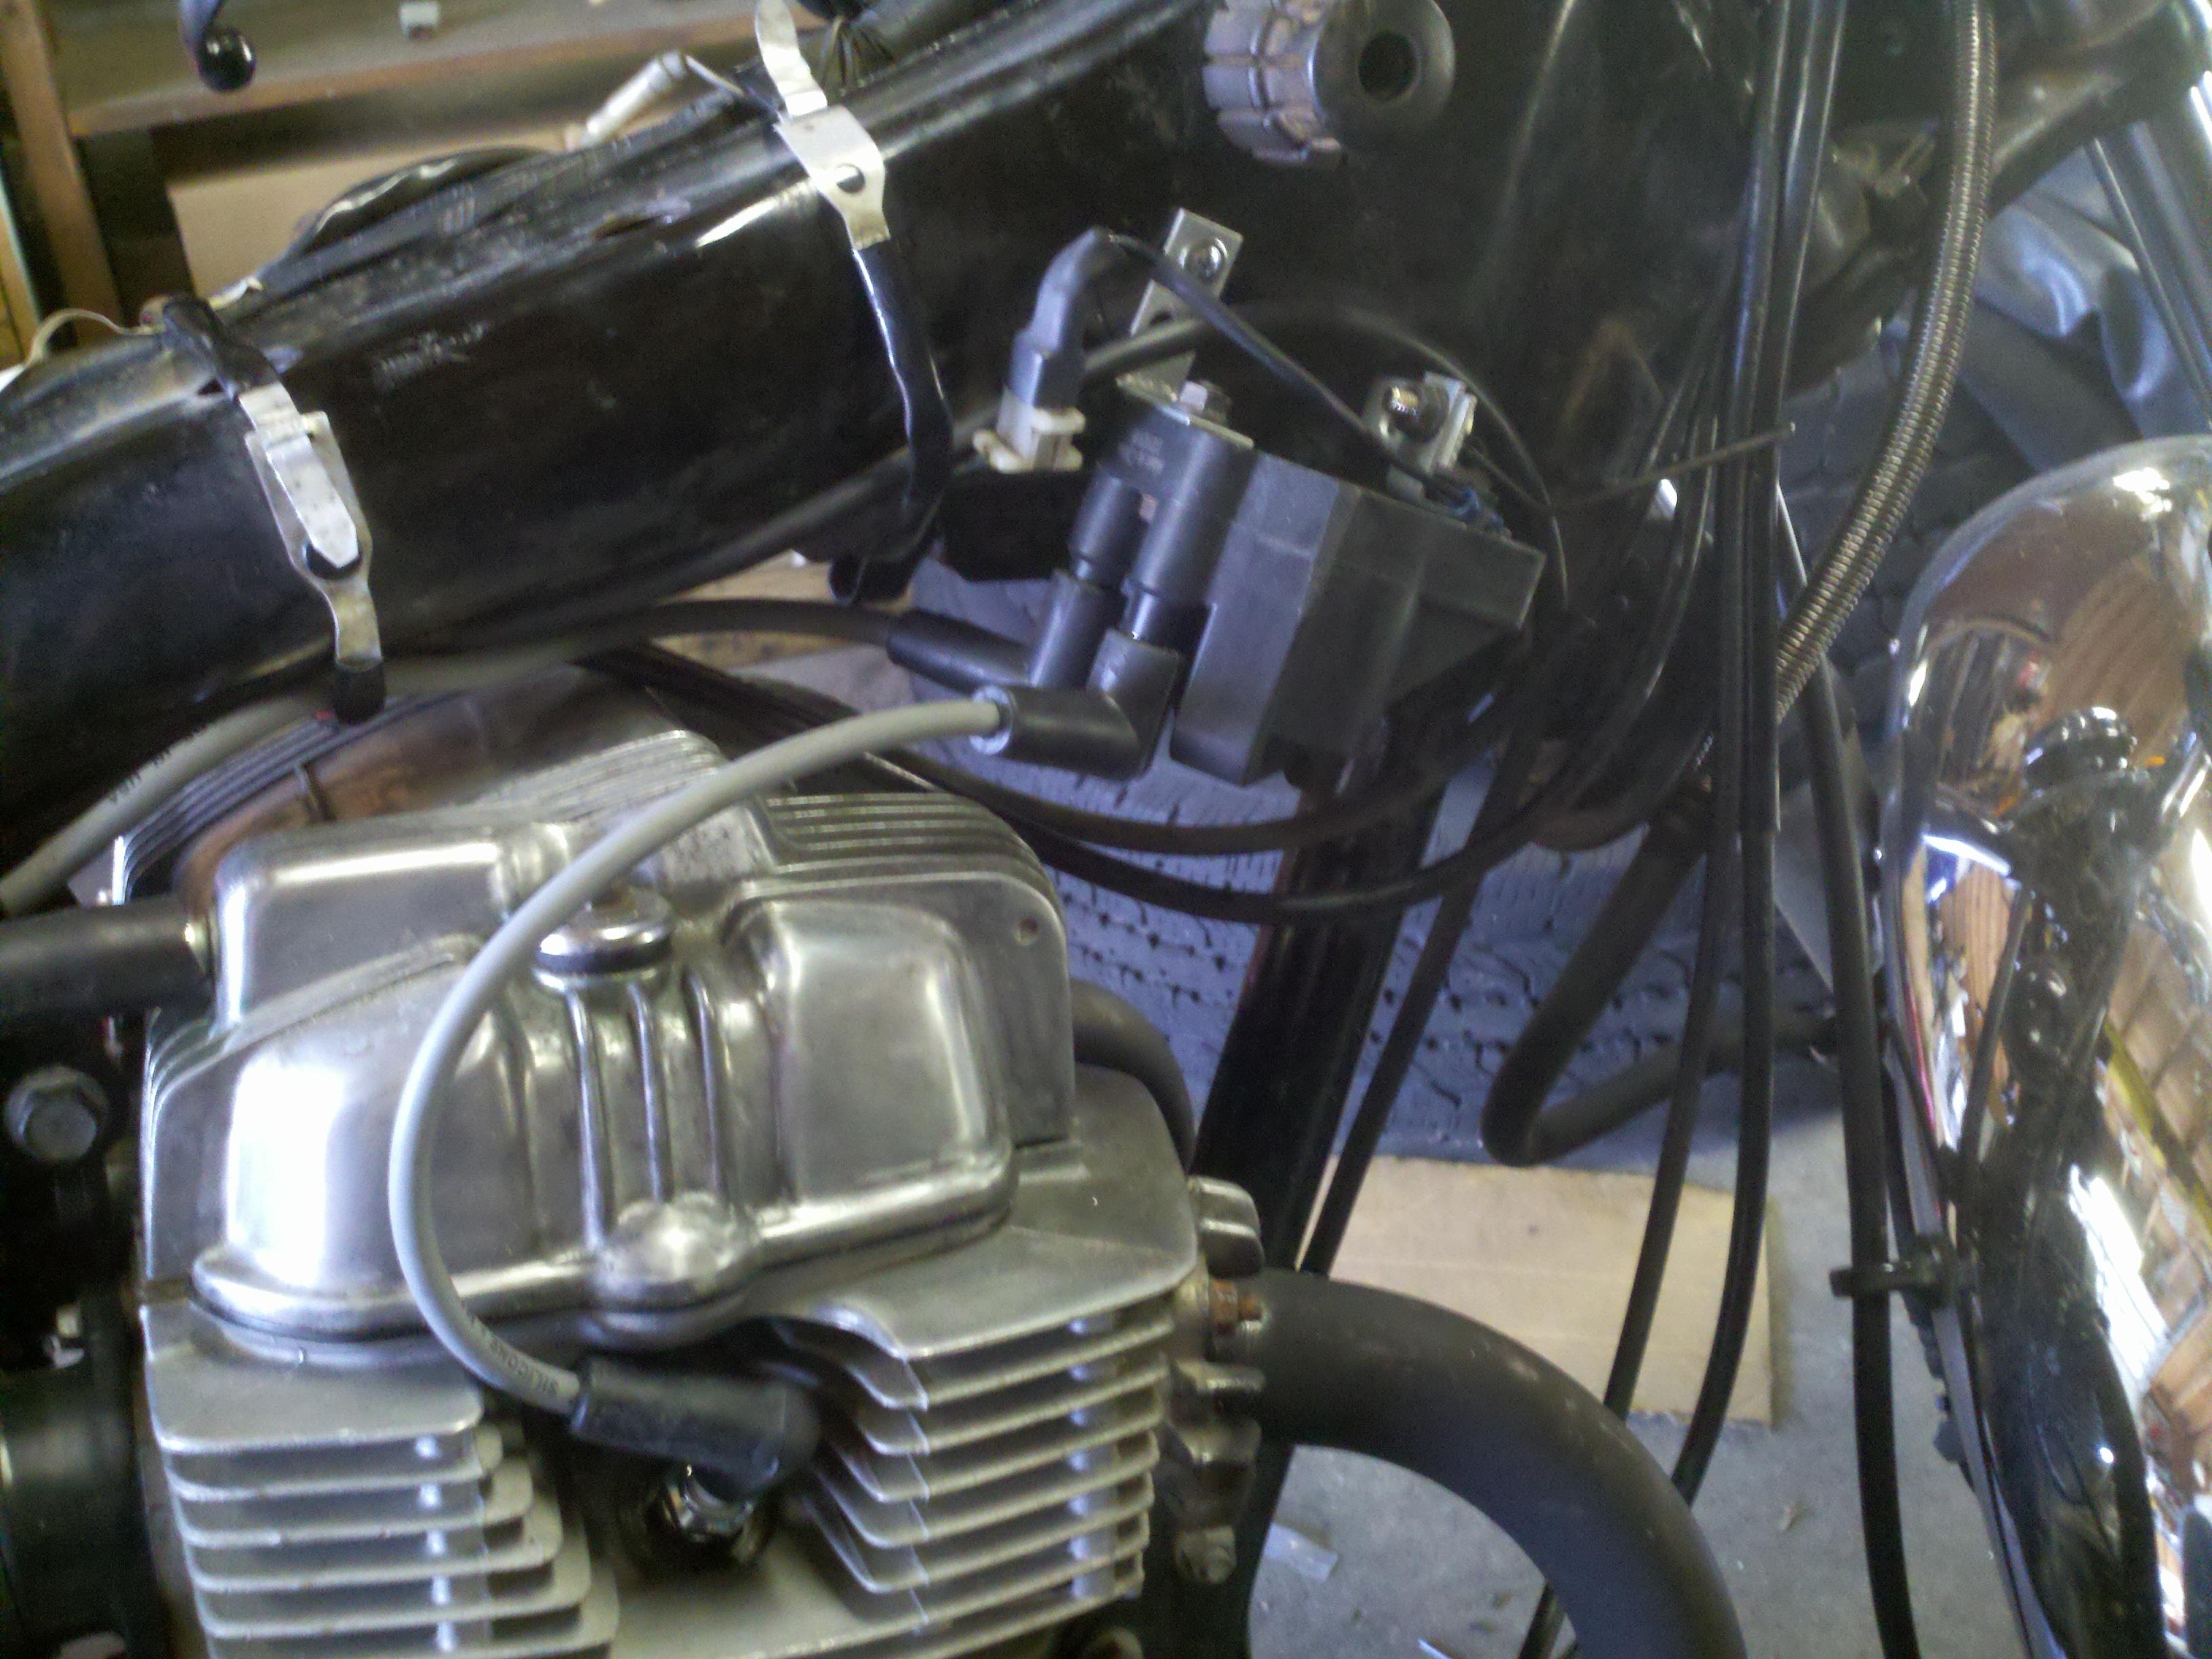 1988 Honda Cb450 Wiring Diagram further Honda Cb550f Wiring Diagram as well Yamaha Xv535 also 1995 Softail Tail Lite Wiring Harness additionally Cb175 Gallery. on wiring diagram honda cb360